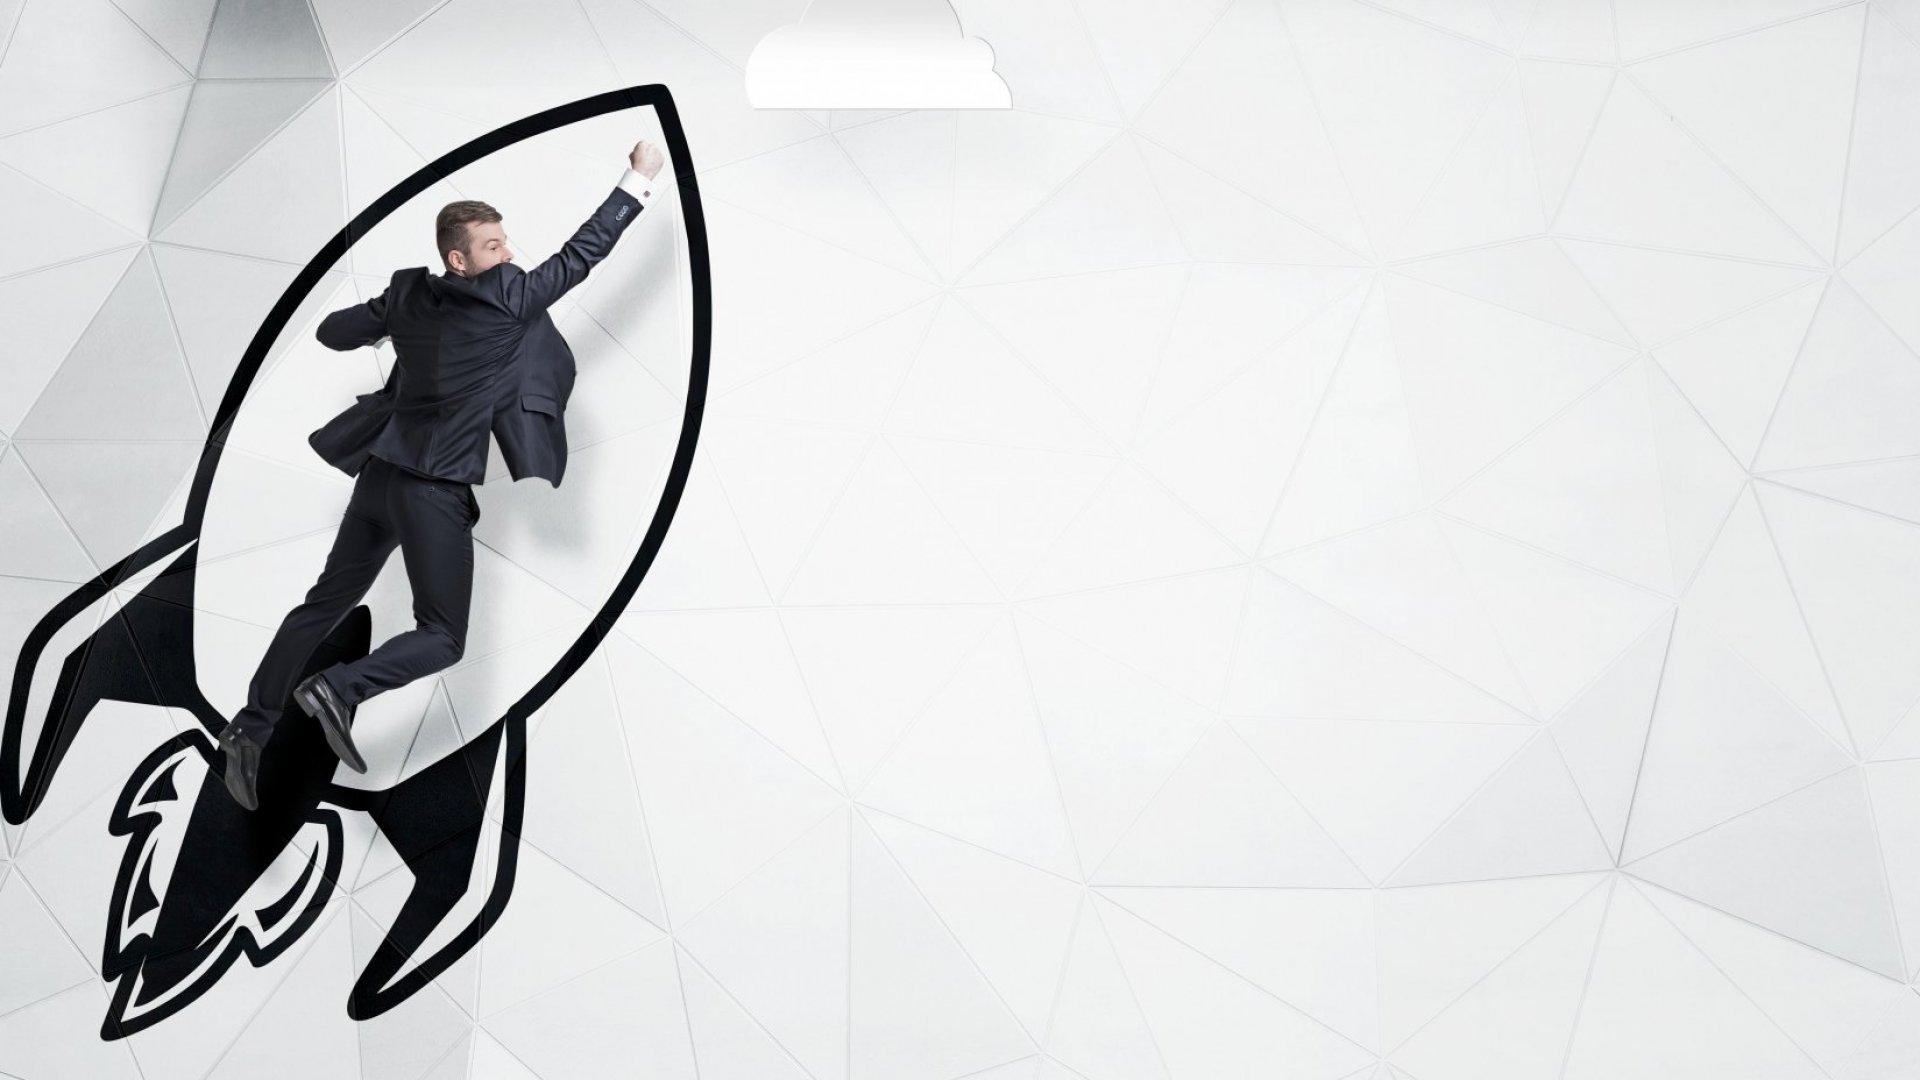 10 Leadership Focus Areas That Build High Performing Teams